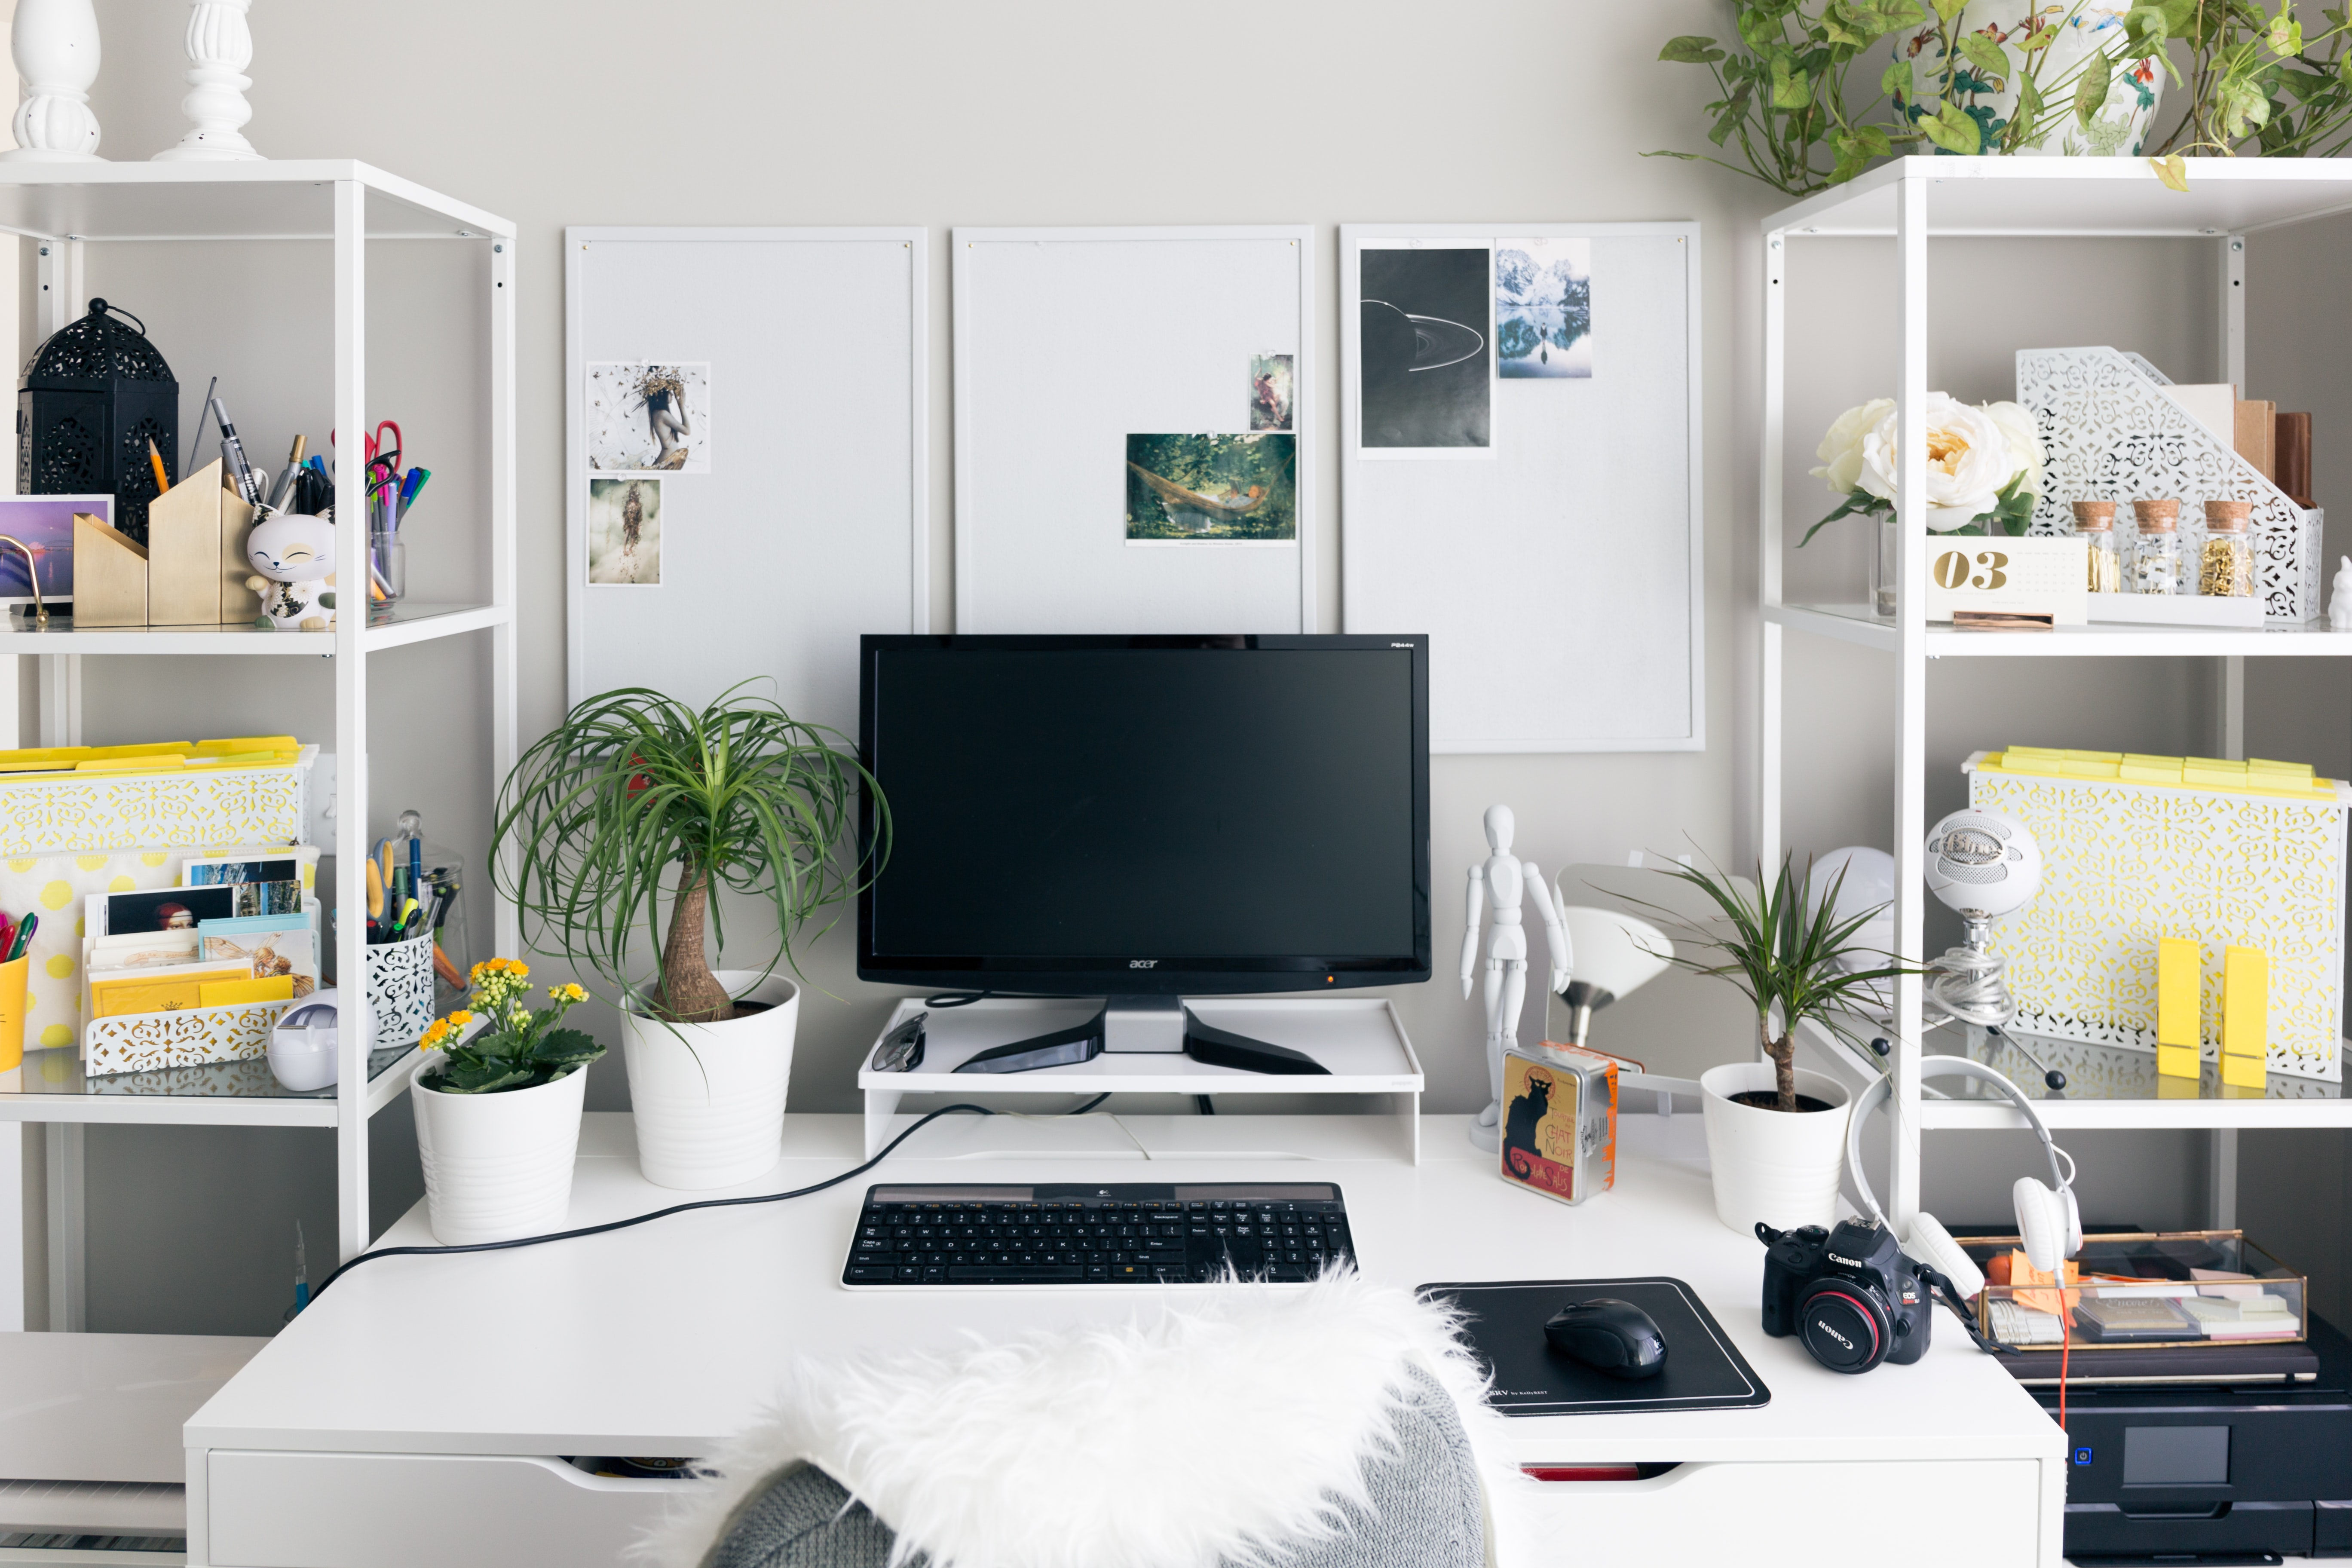 home office whiteboards, white desk and white shelving